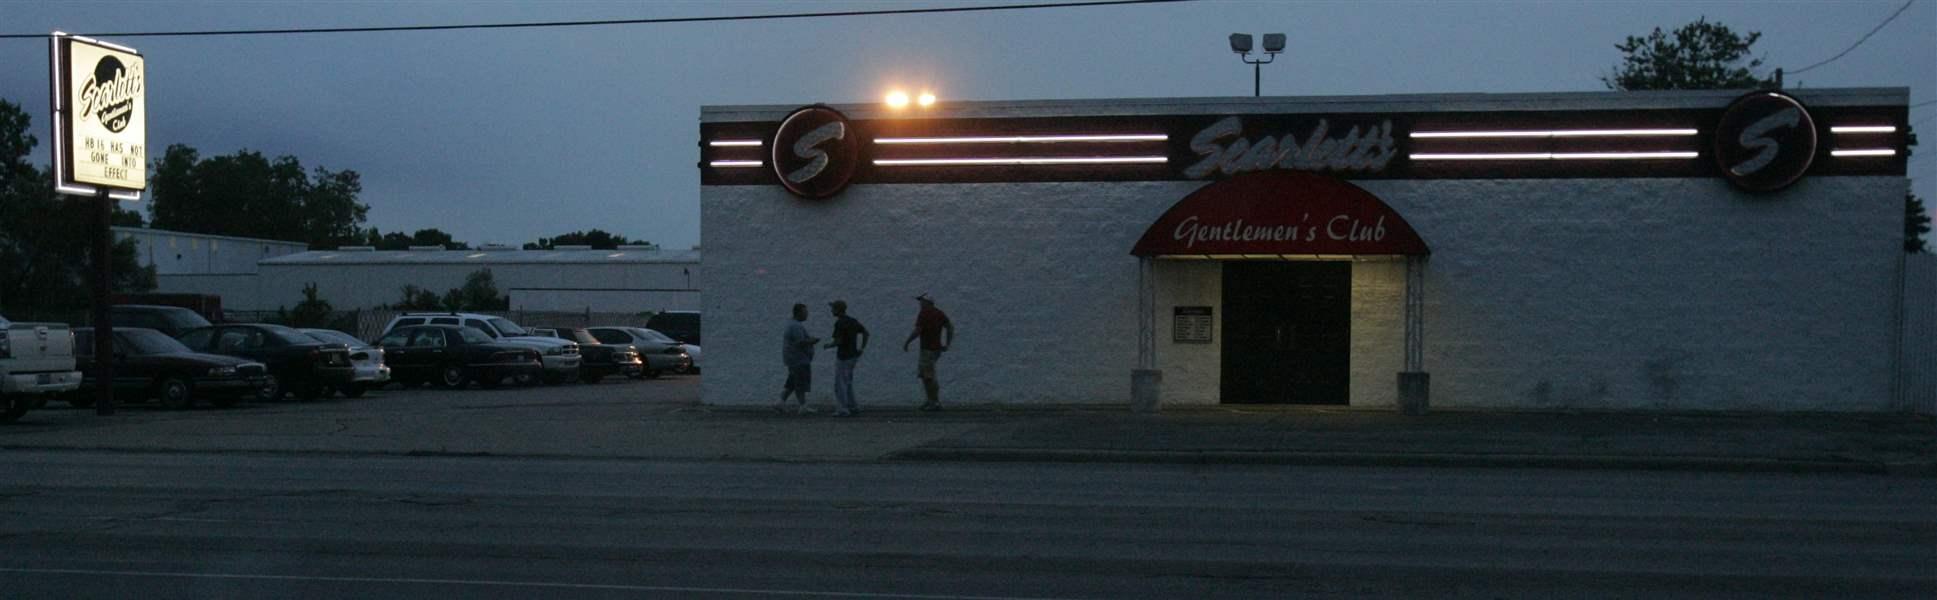 Strip clubs in toledo ohio